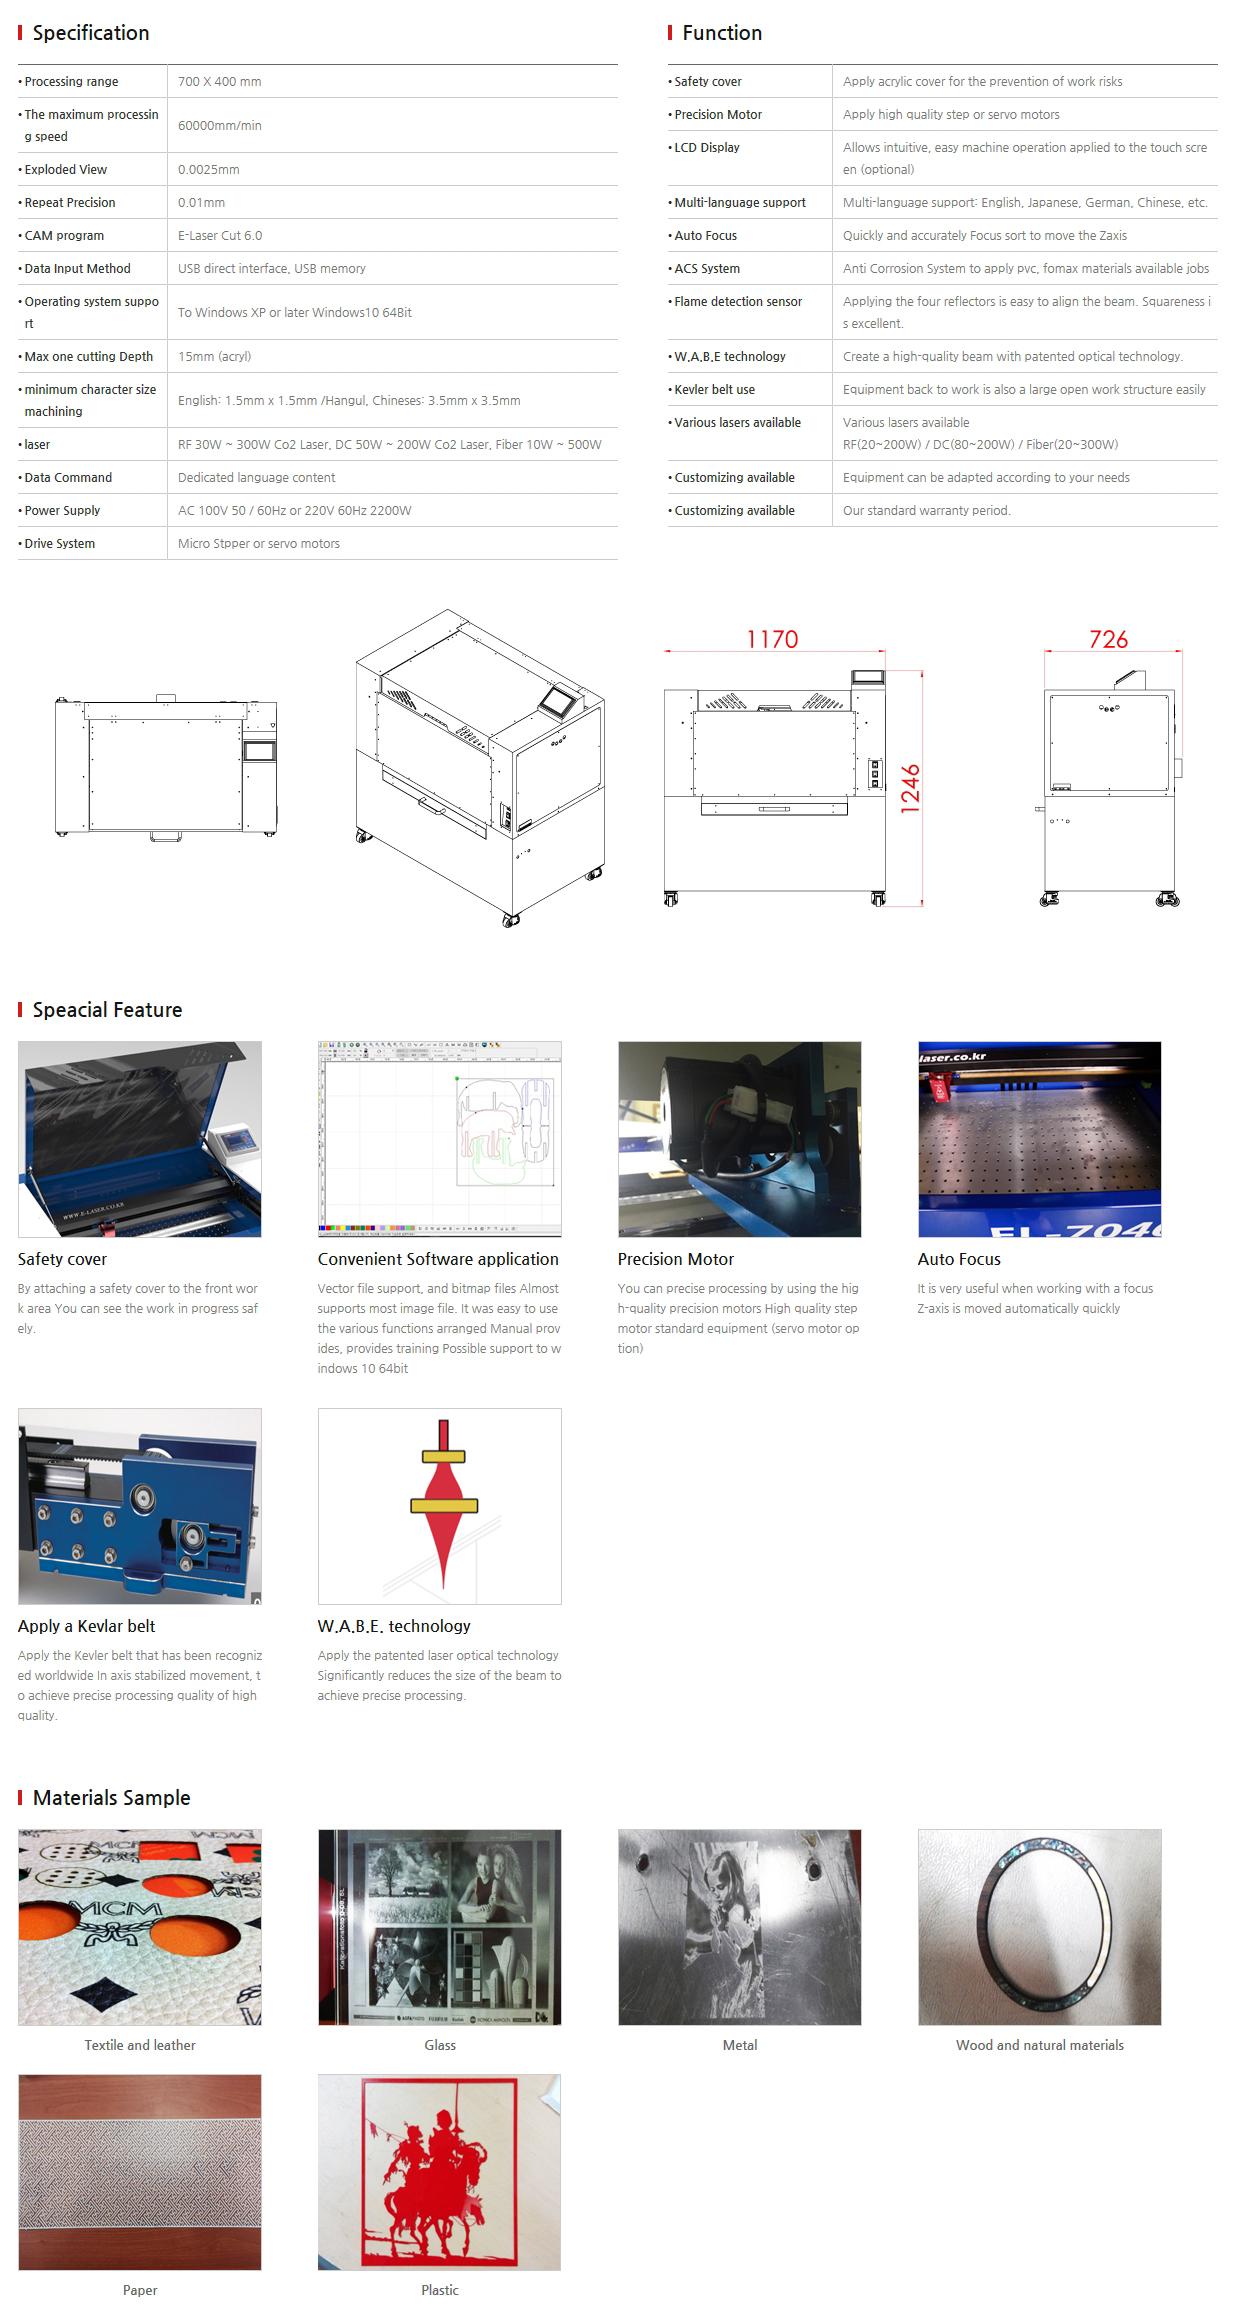 E-LASER Laser Cutting (Only non-metal) EL-7040 LK